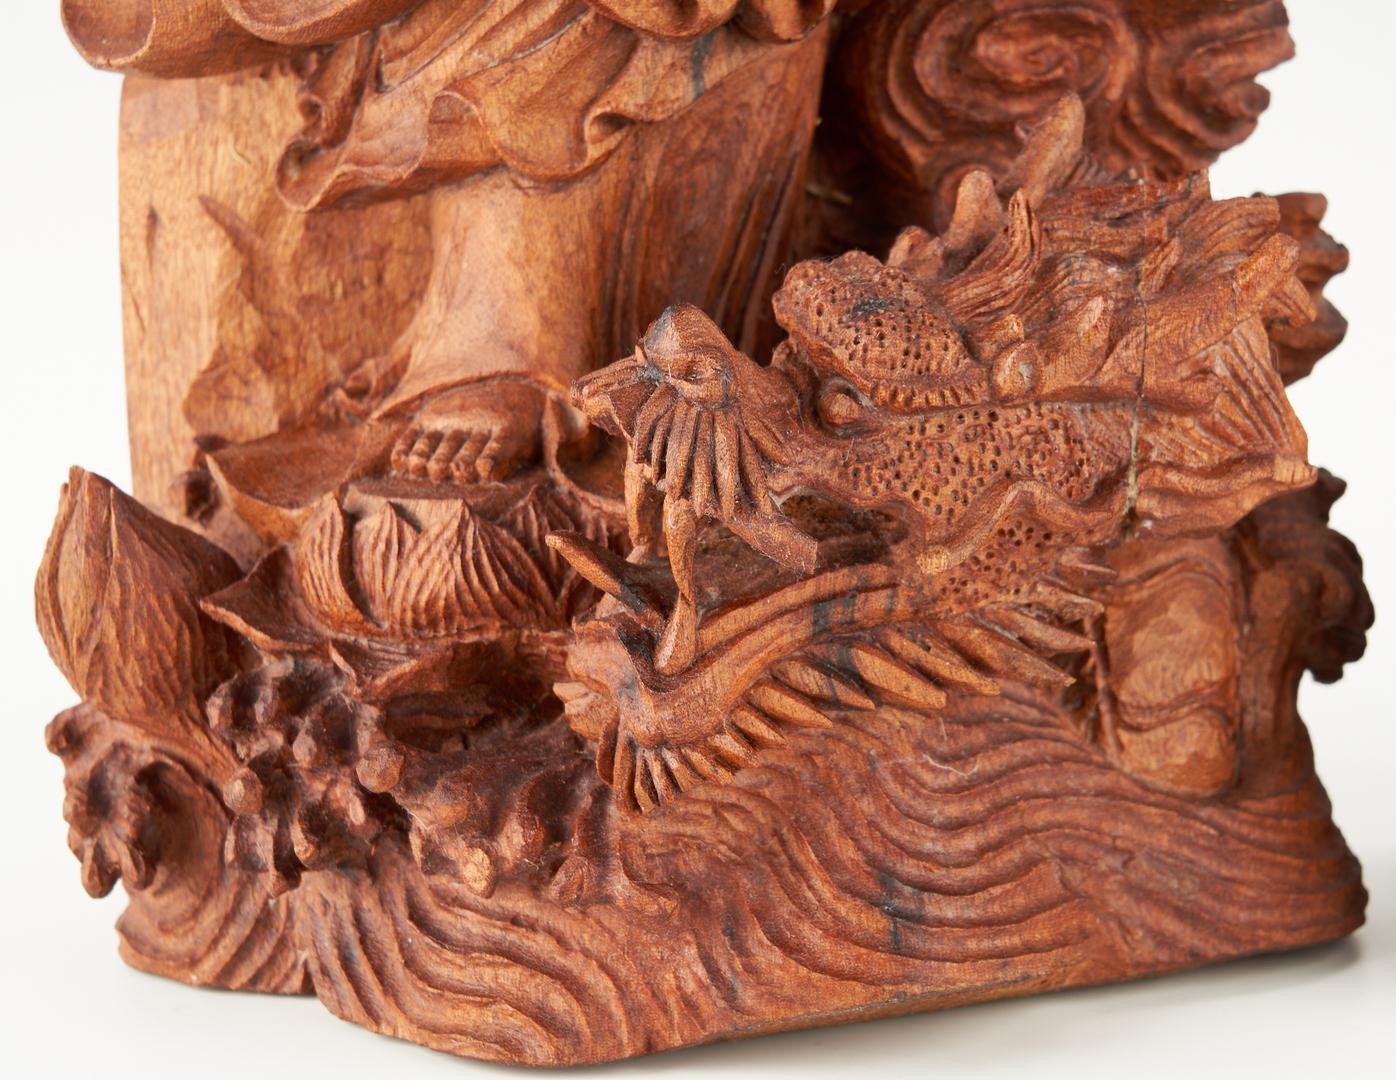 Lot 1194: 2 Asian Carved Wood Figures, Guanyin & Buddha